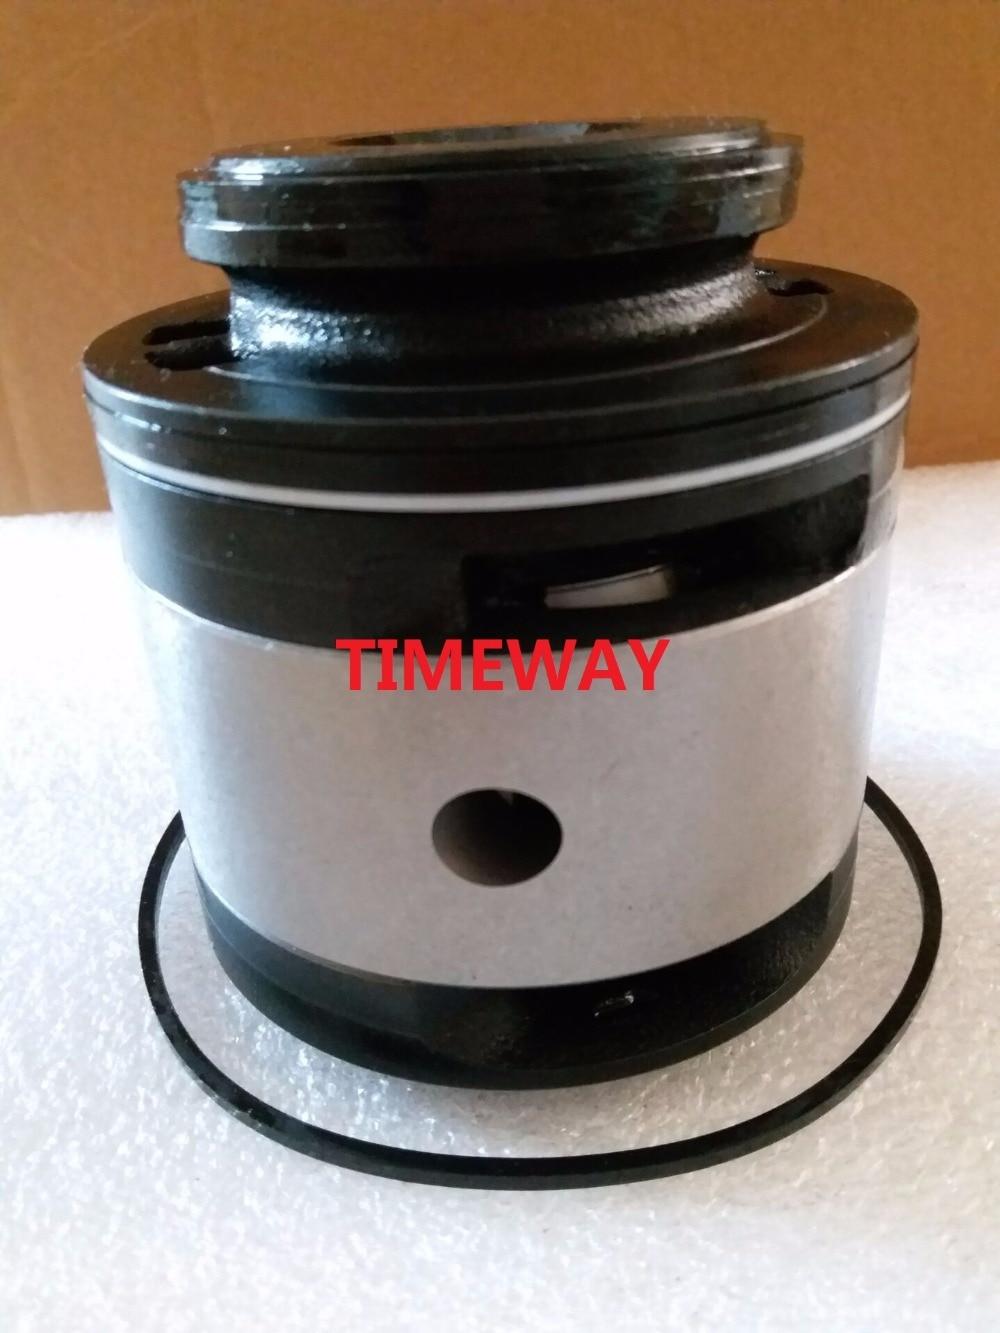 DENISON series T6CC 014 010 3R01 C111 single hydraulic vane pump core cartridge  rivaldy rivaldy r 2031 010